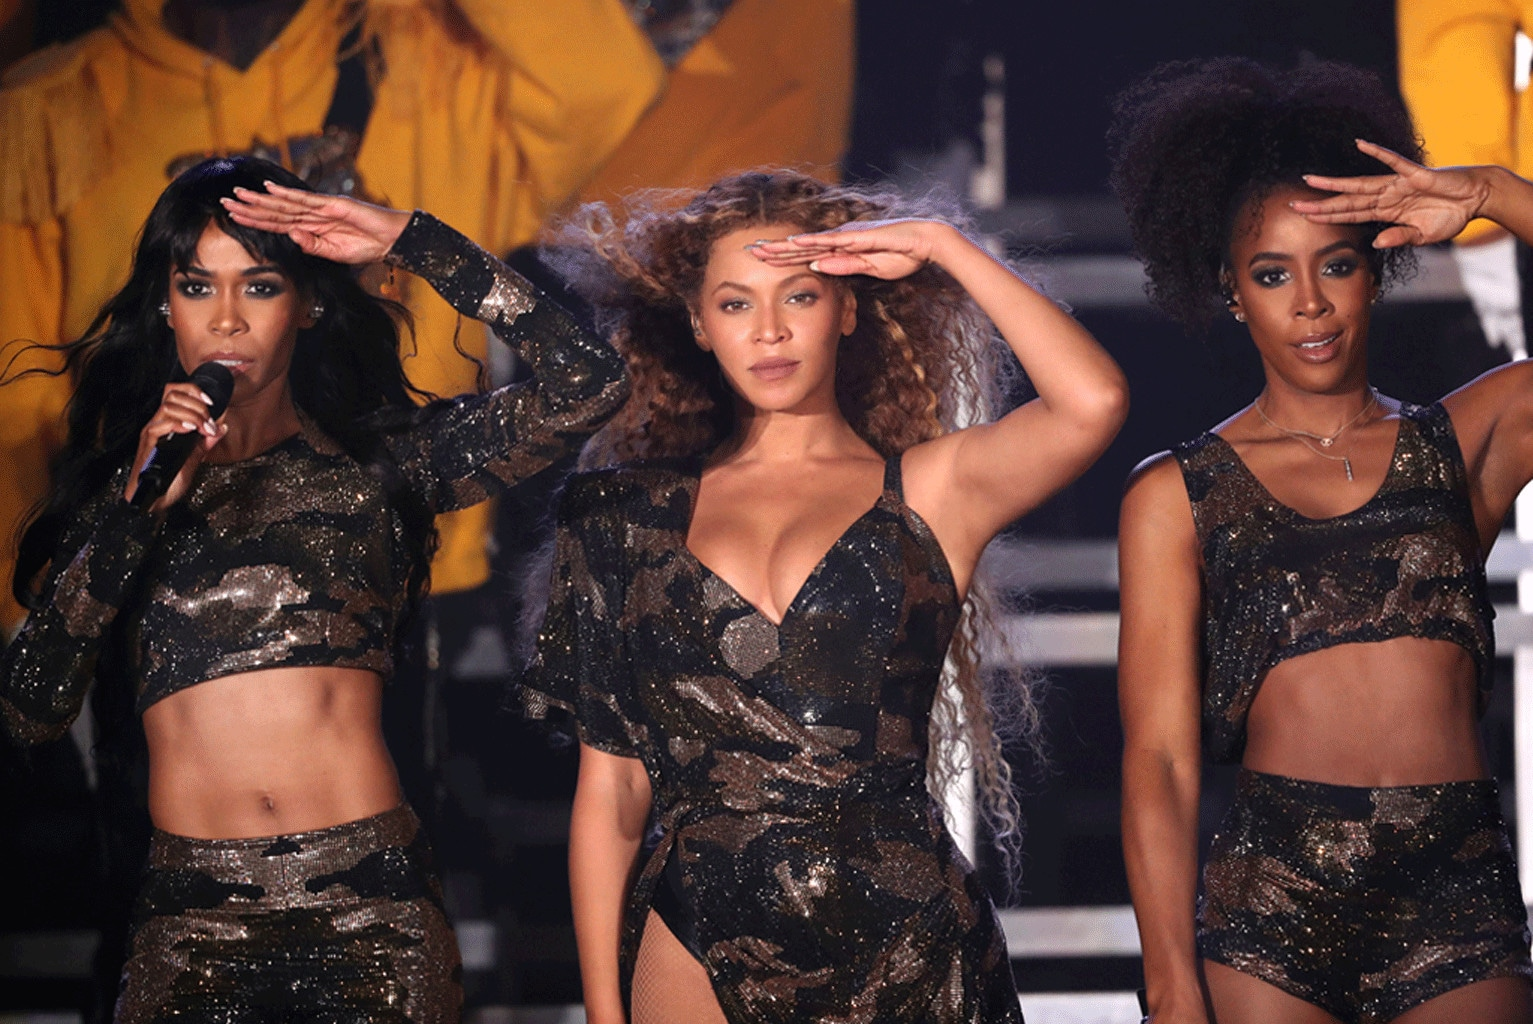 Beyonce, Destiny's Child, Kelly Rowland, Michelle Williams, Coachella, 2018